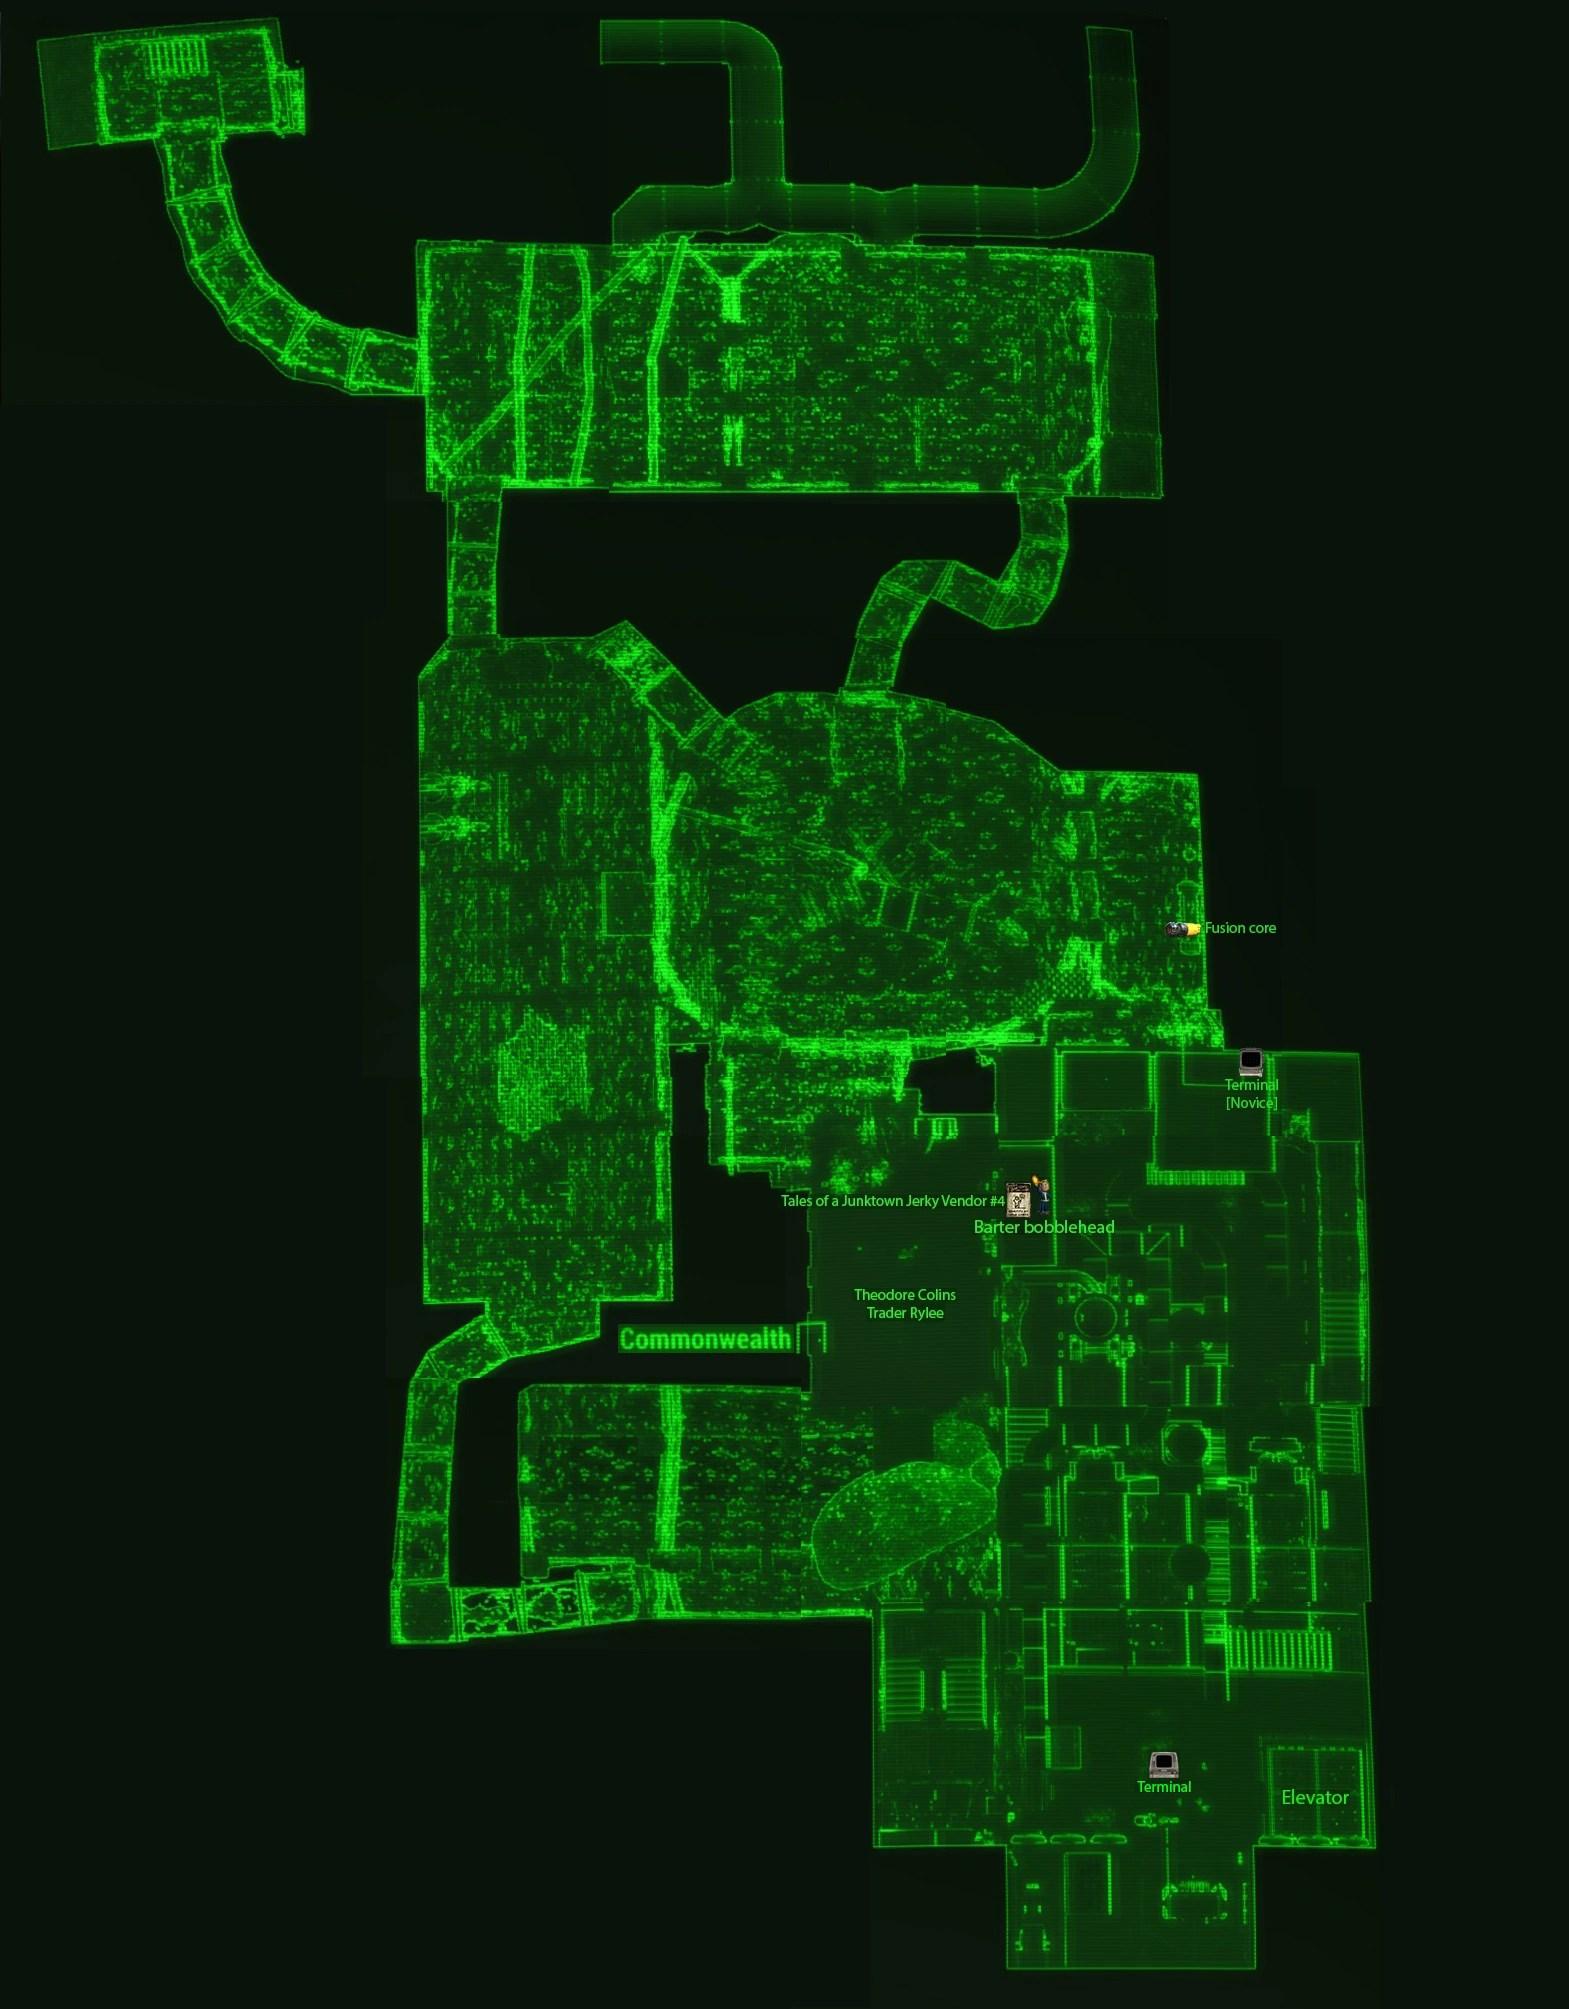 Relay Tower Osc-527 : relay, tower, osc-527, Longneck, Lukowski's, Cannery, Fallout, Fandom